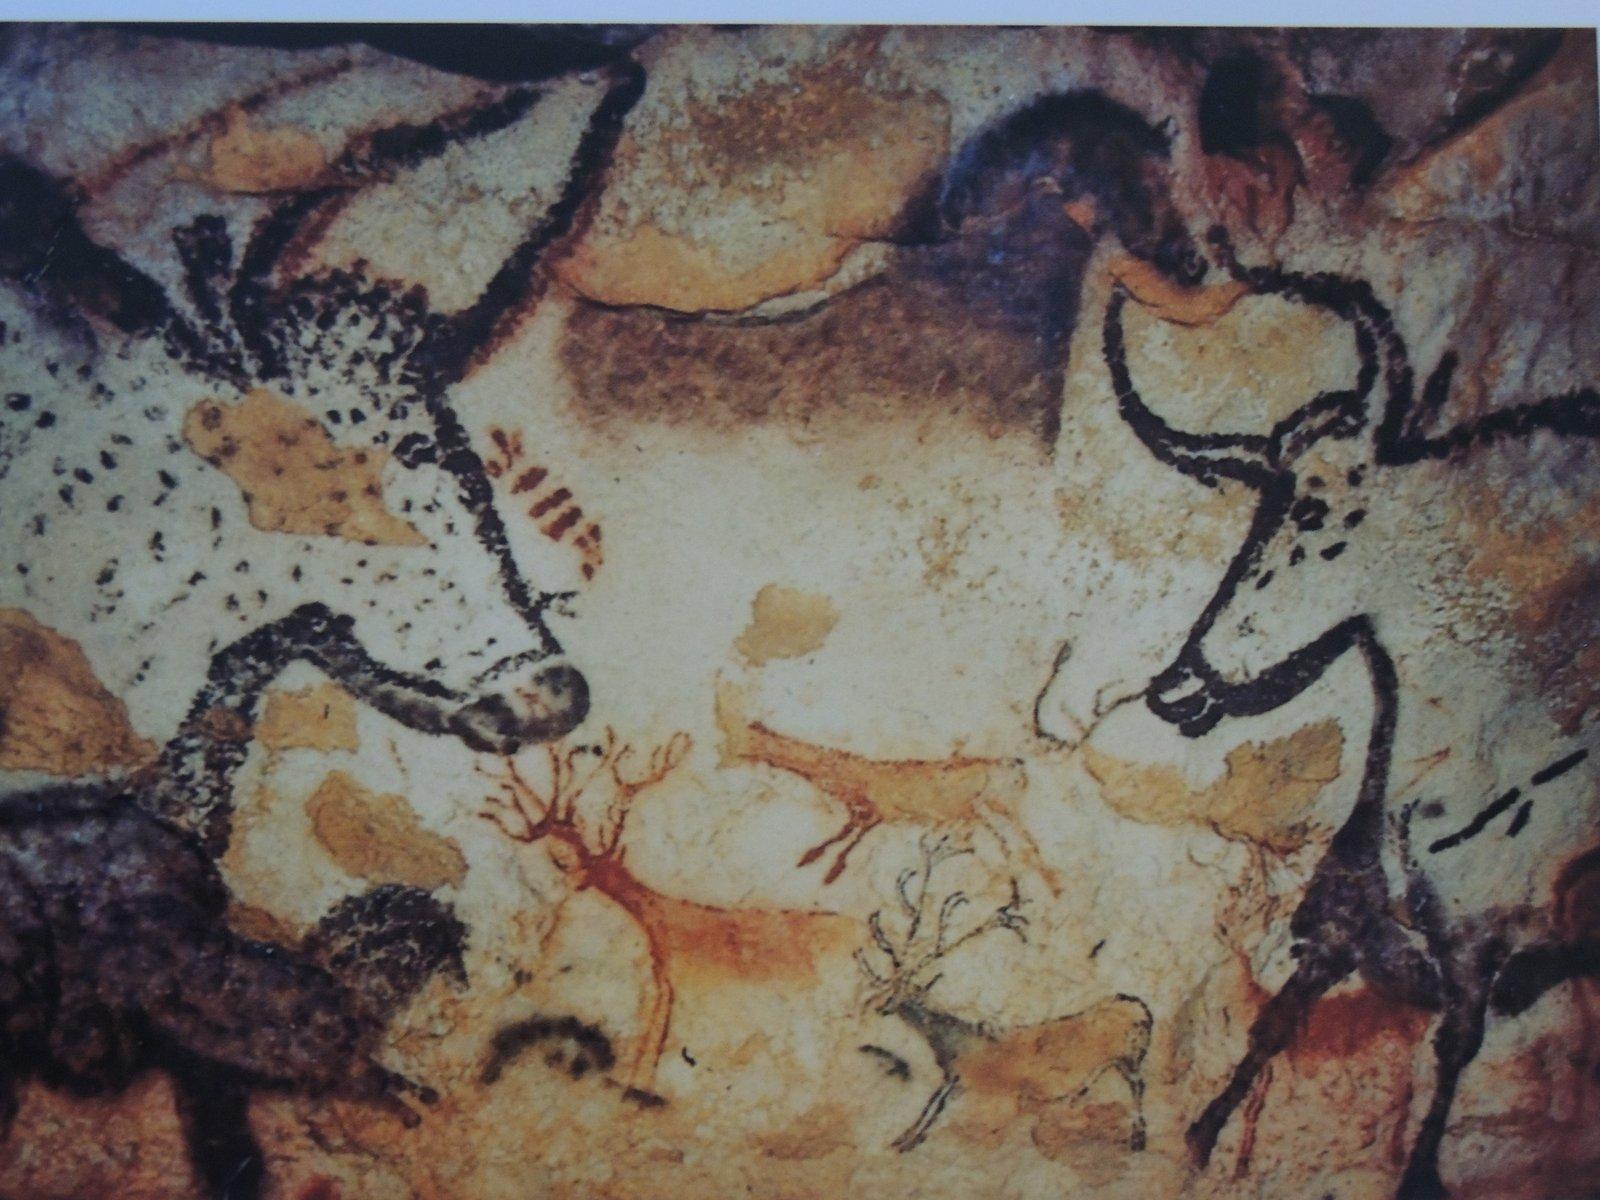 Cro Magnon Man Cave Art : The french connection take quot cro magnon caves lascaux ii